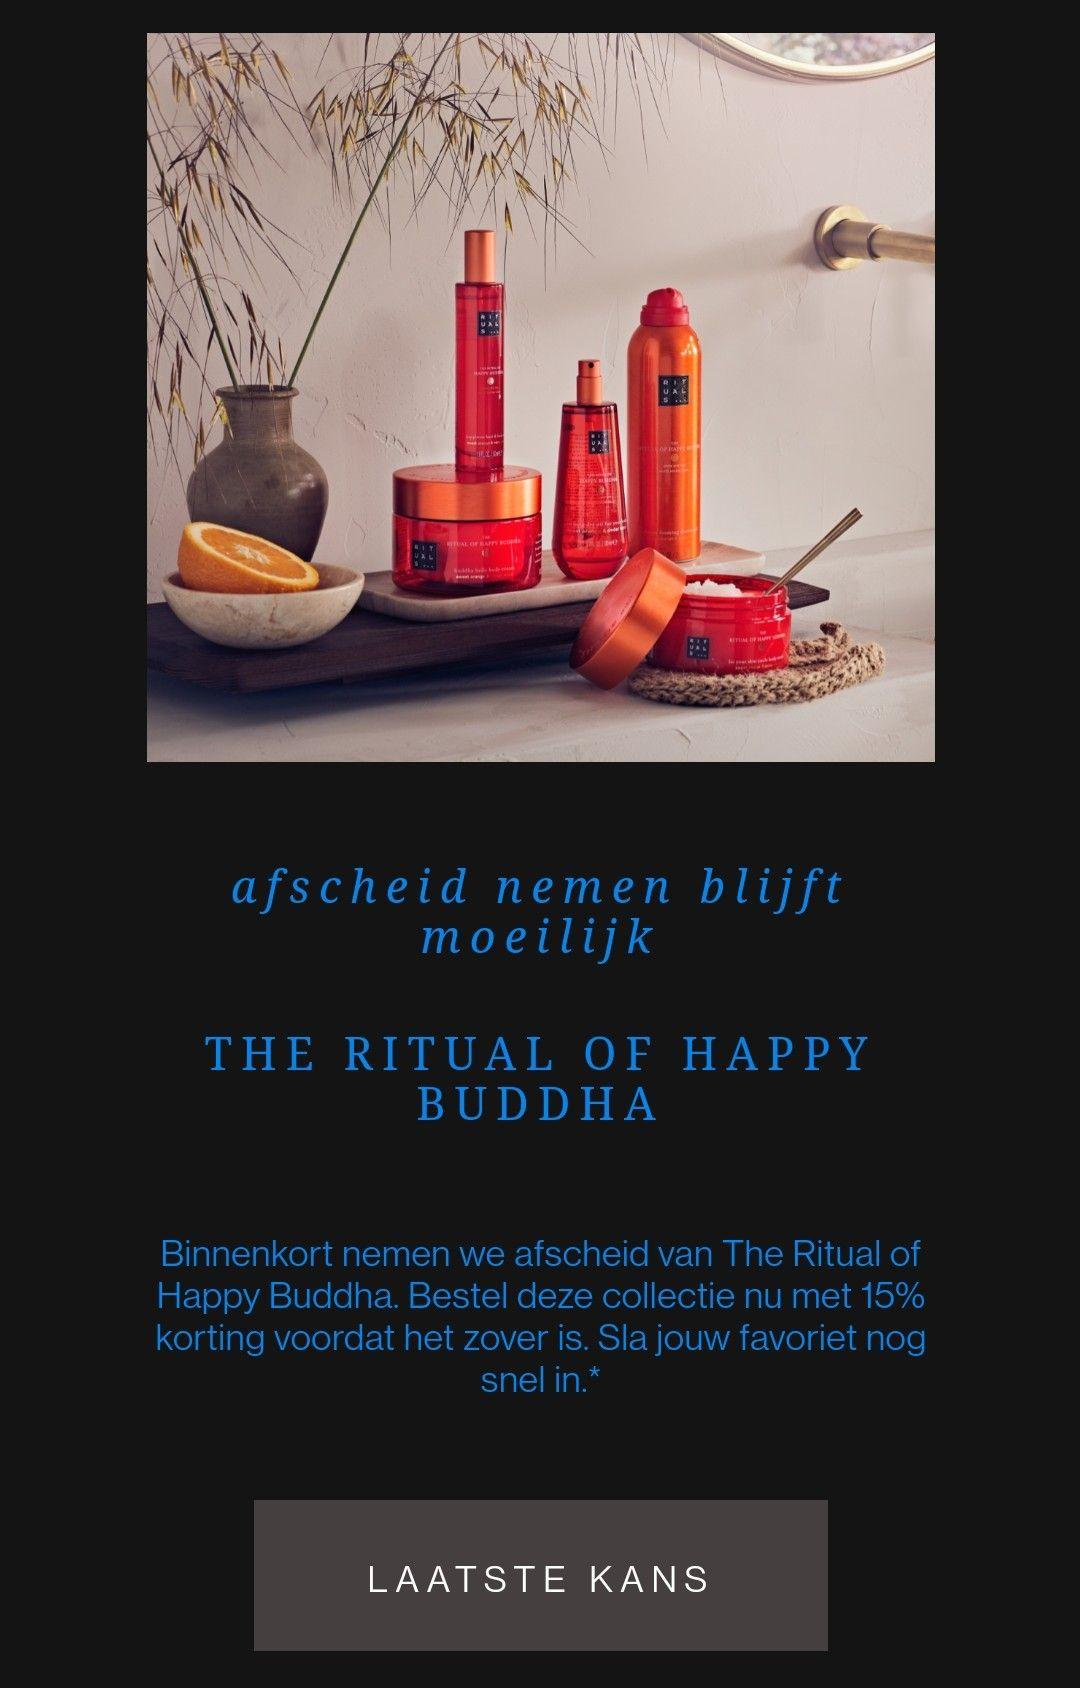 15% korting op Ritual of Happy Buddha assortiment